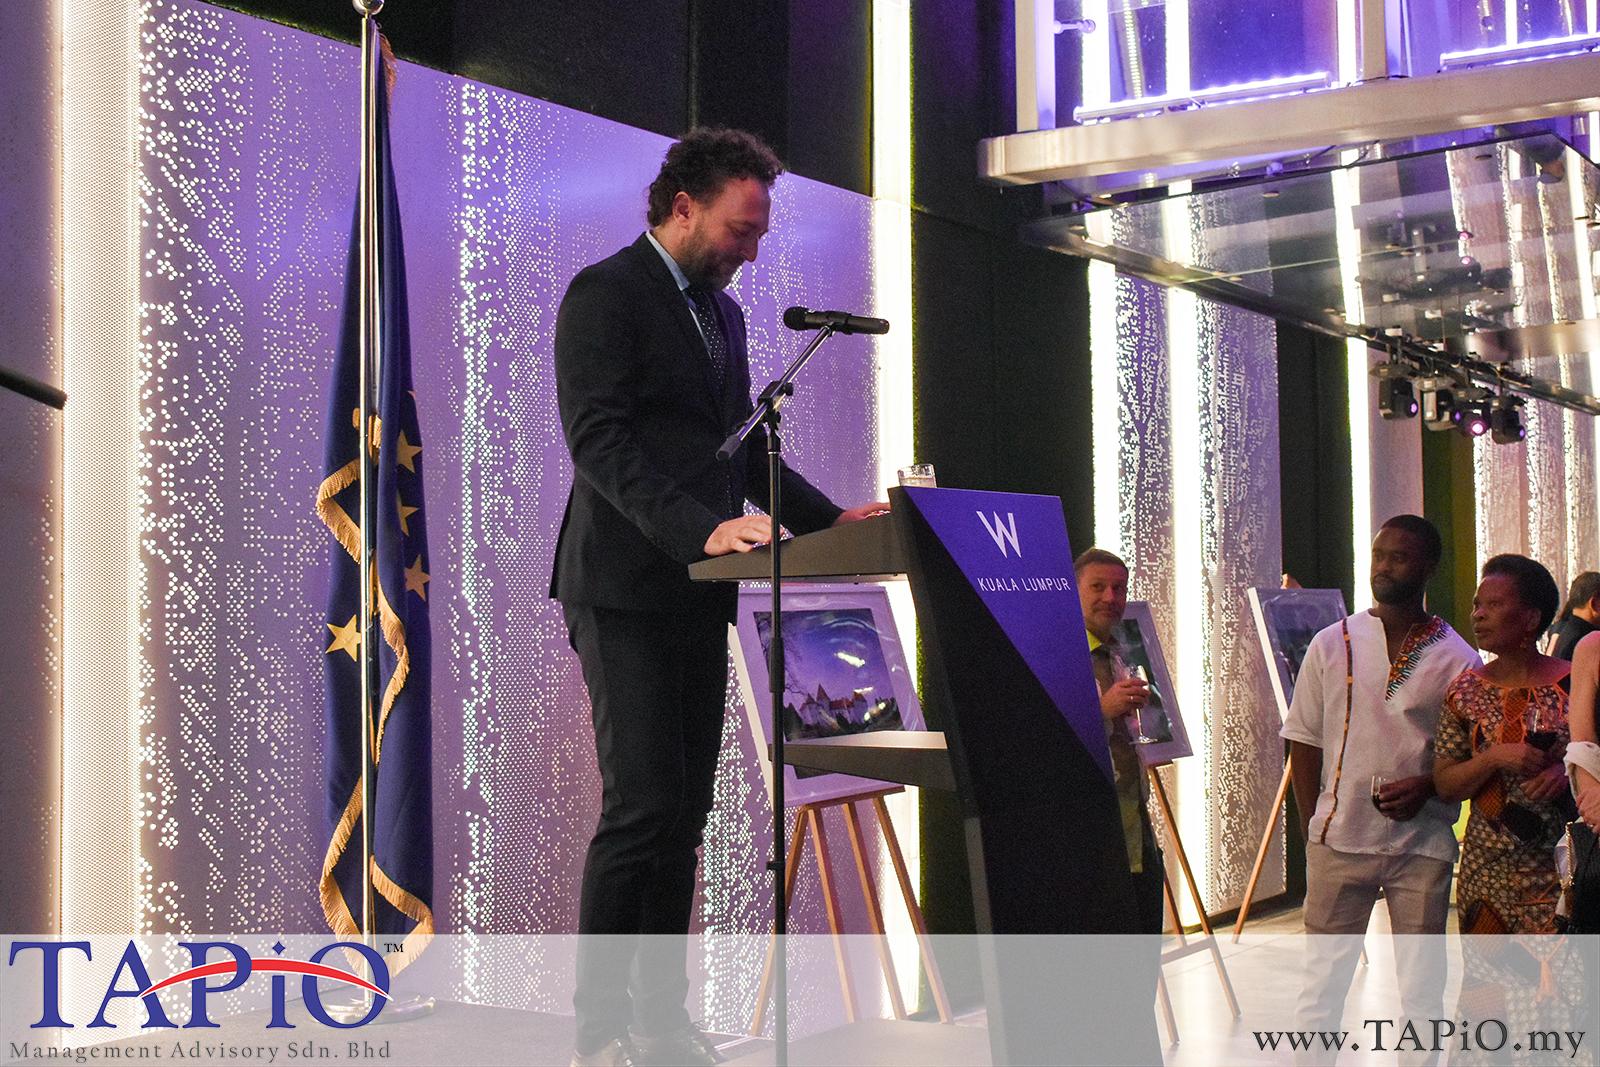 Ambassador of Croatia to Malaysia H.E. Kreso Glavac giving a speech.